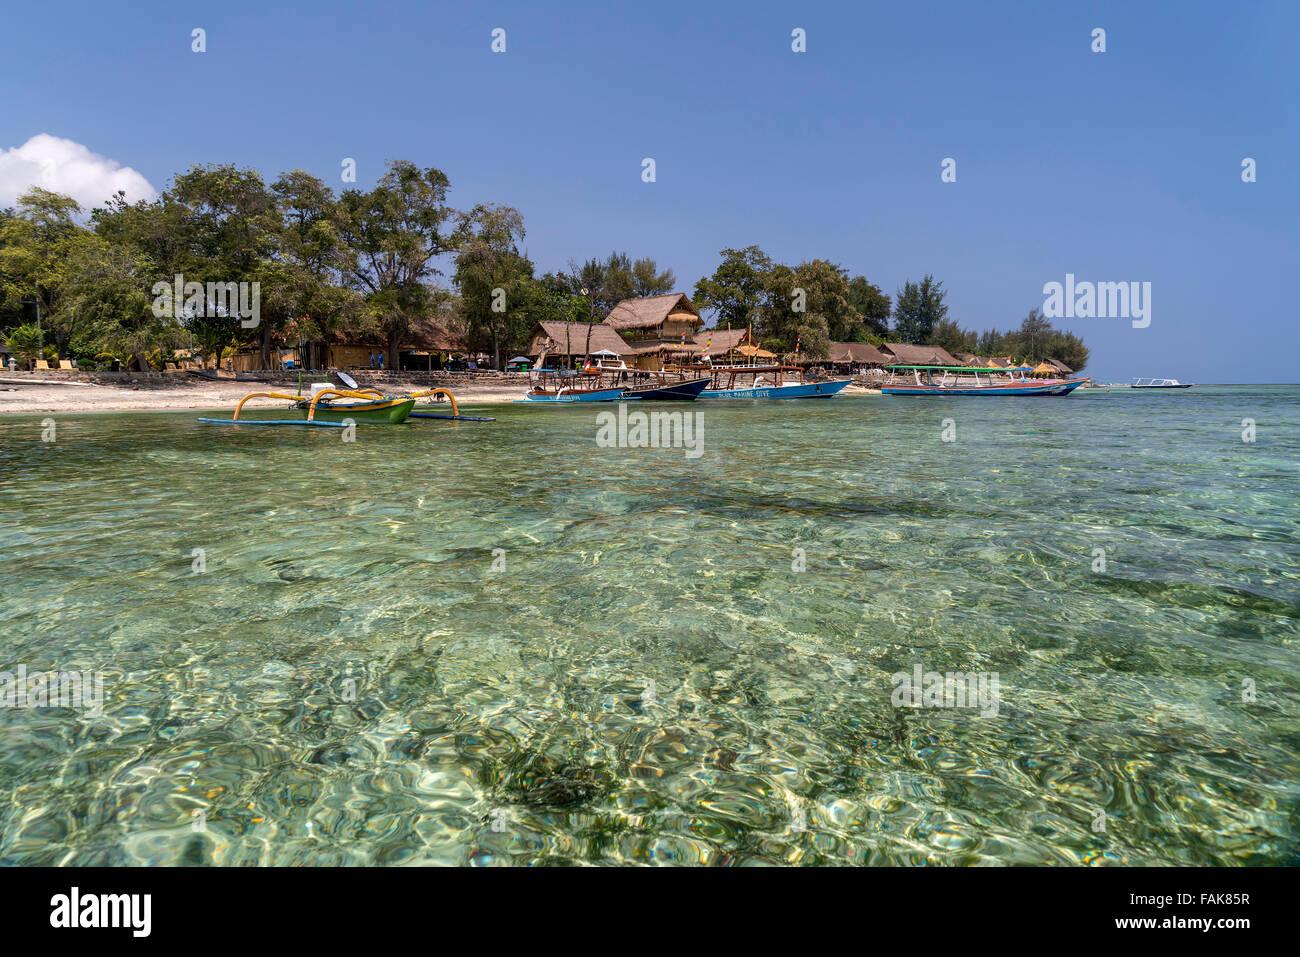 Playa de la pequeña isla de Gili Air, Indonesia, Lombok, asi Imagen De Stock